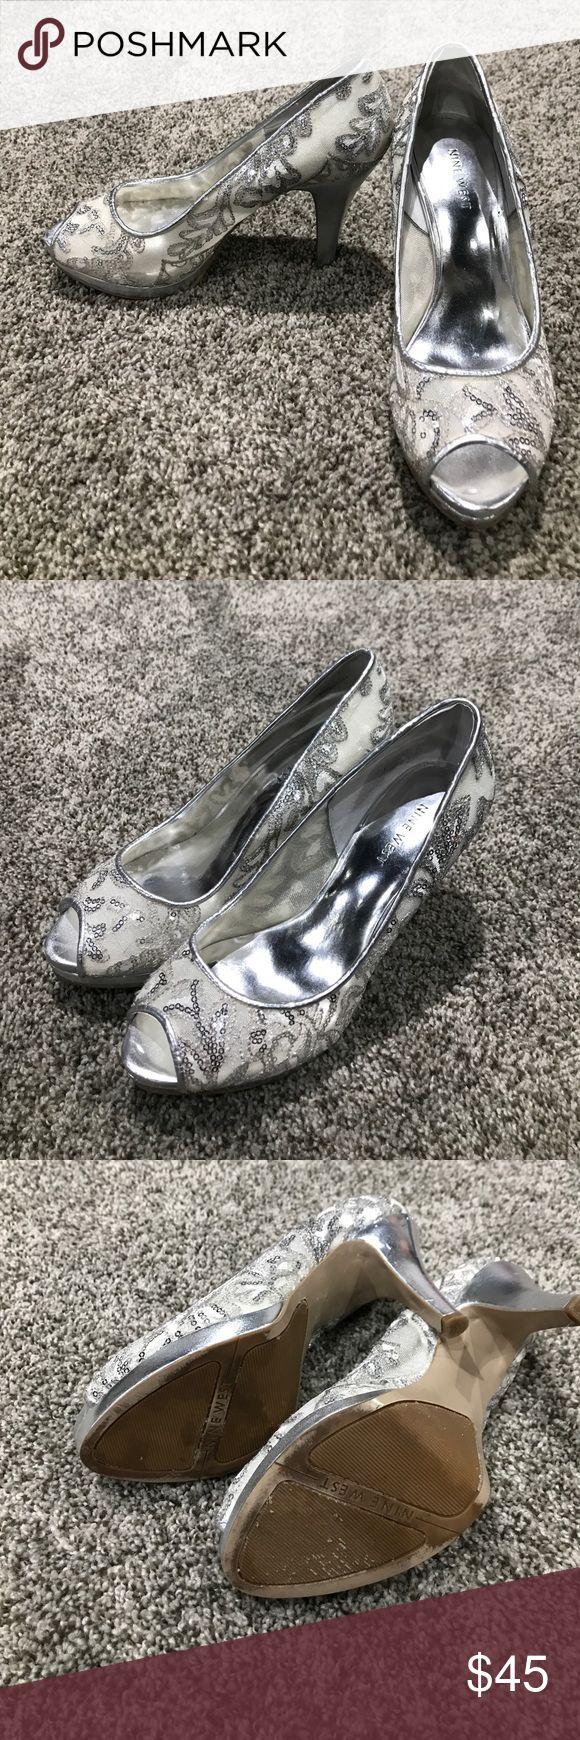 Nine West silver sequence peep toe heels Silver peep toe heels with some silver and white embroidery. Worn once. Great shape. Size 7M Nine West Shoes Heels